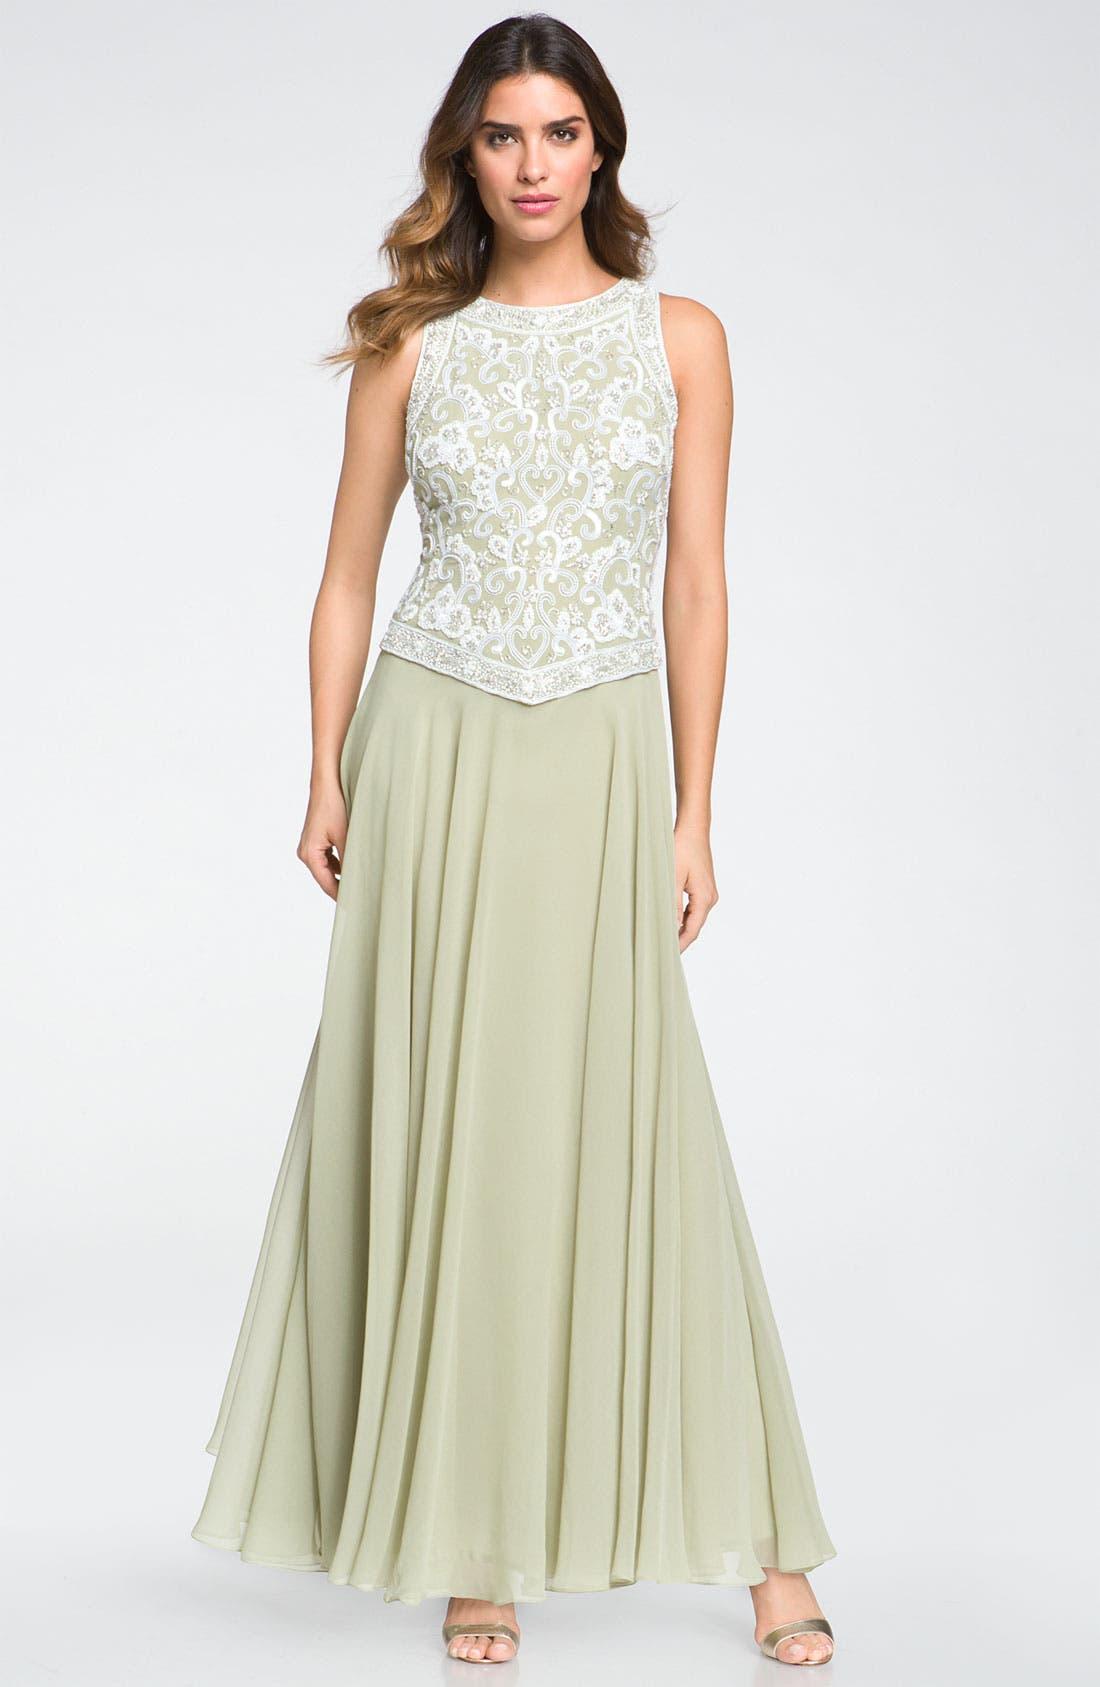 Alternate Image 1 Selected - J Kara Embellished Sleeveless Crepe Gown